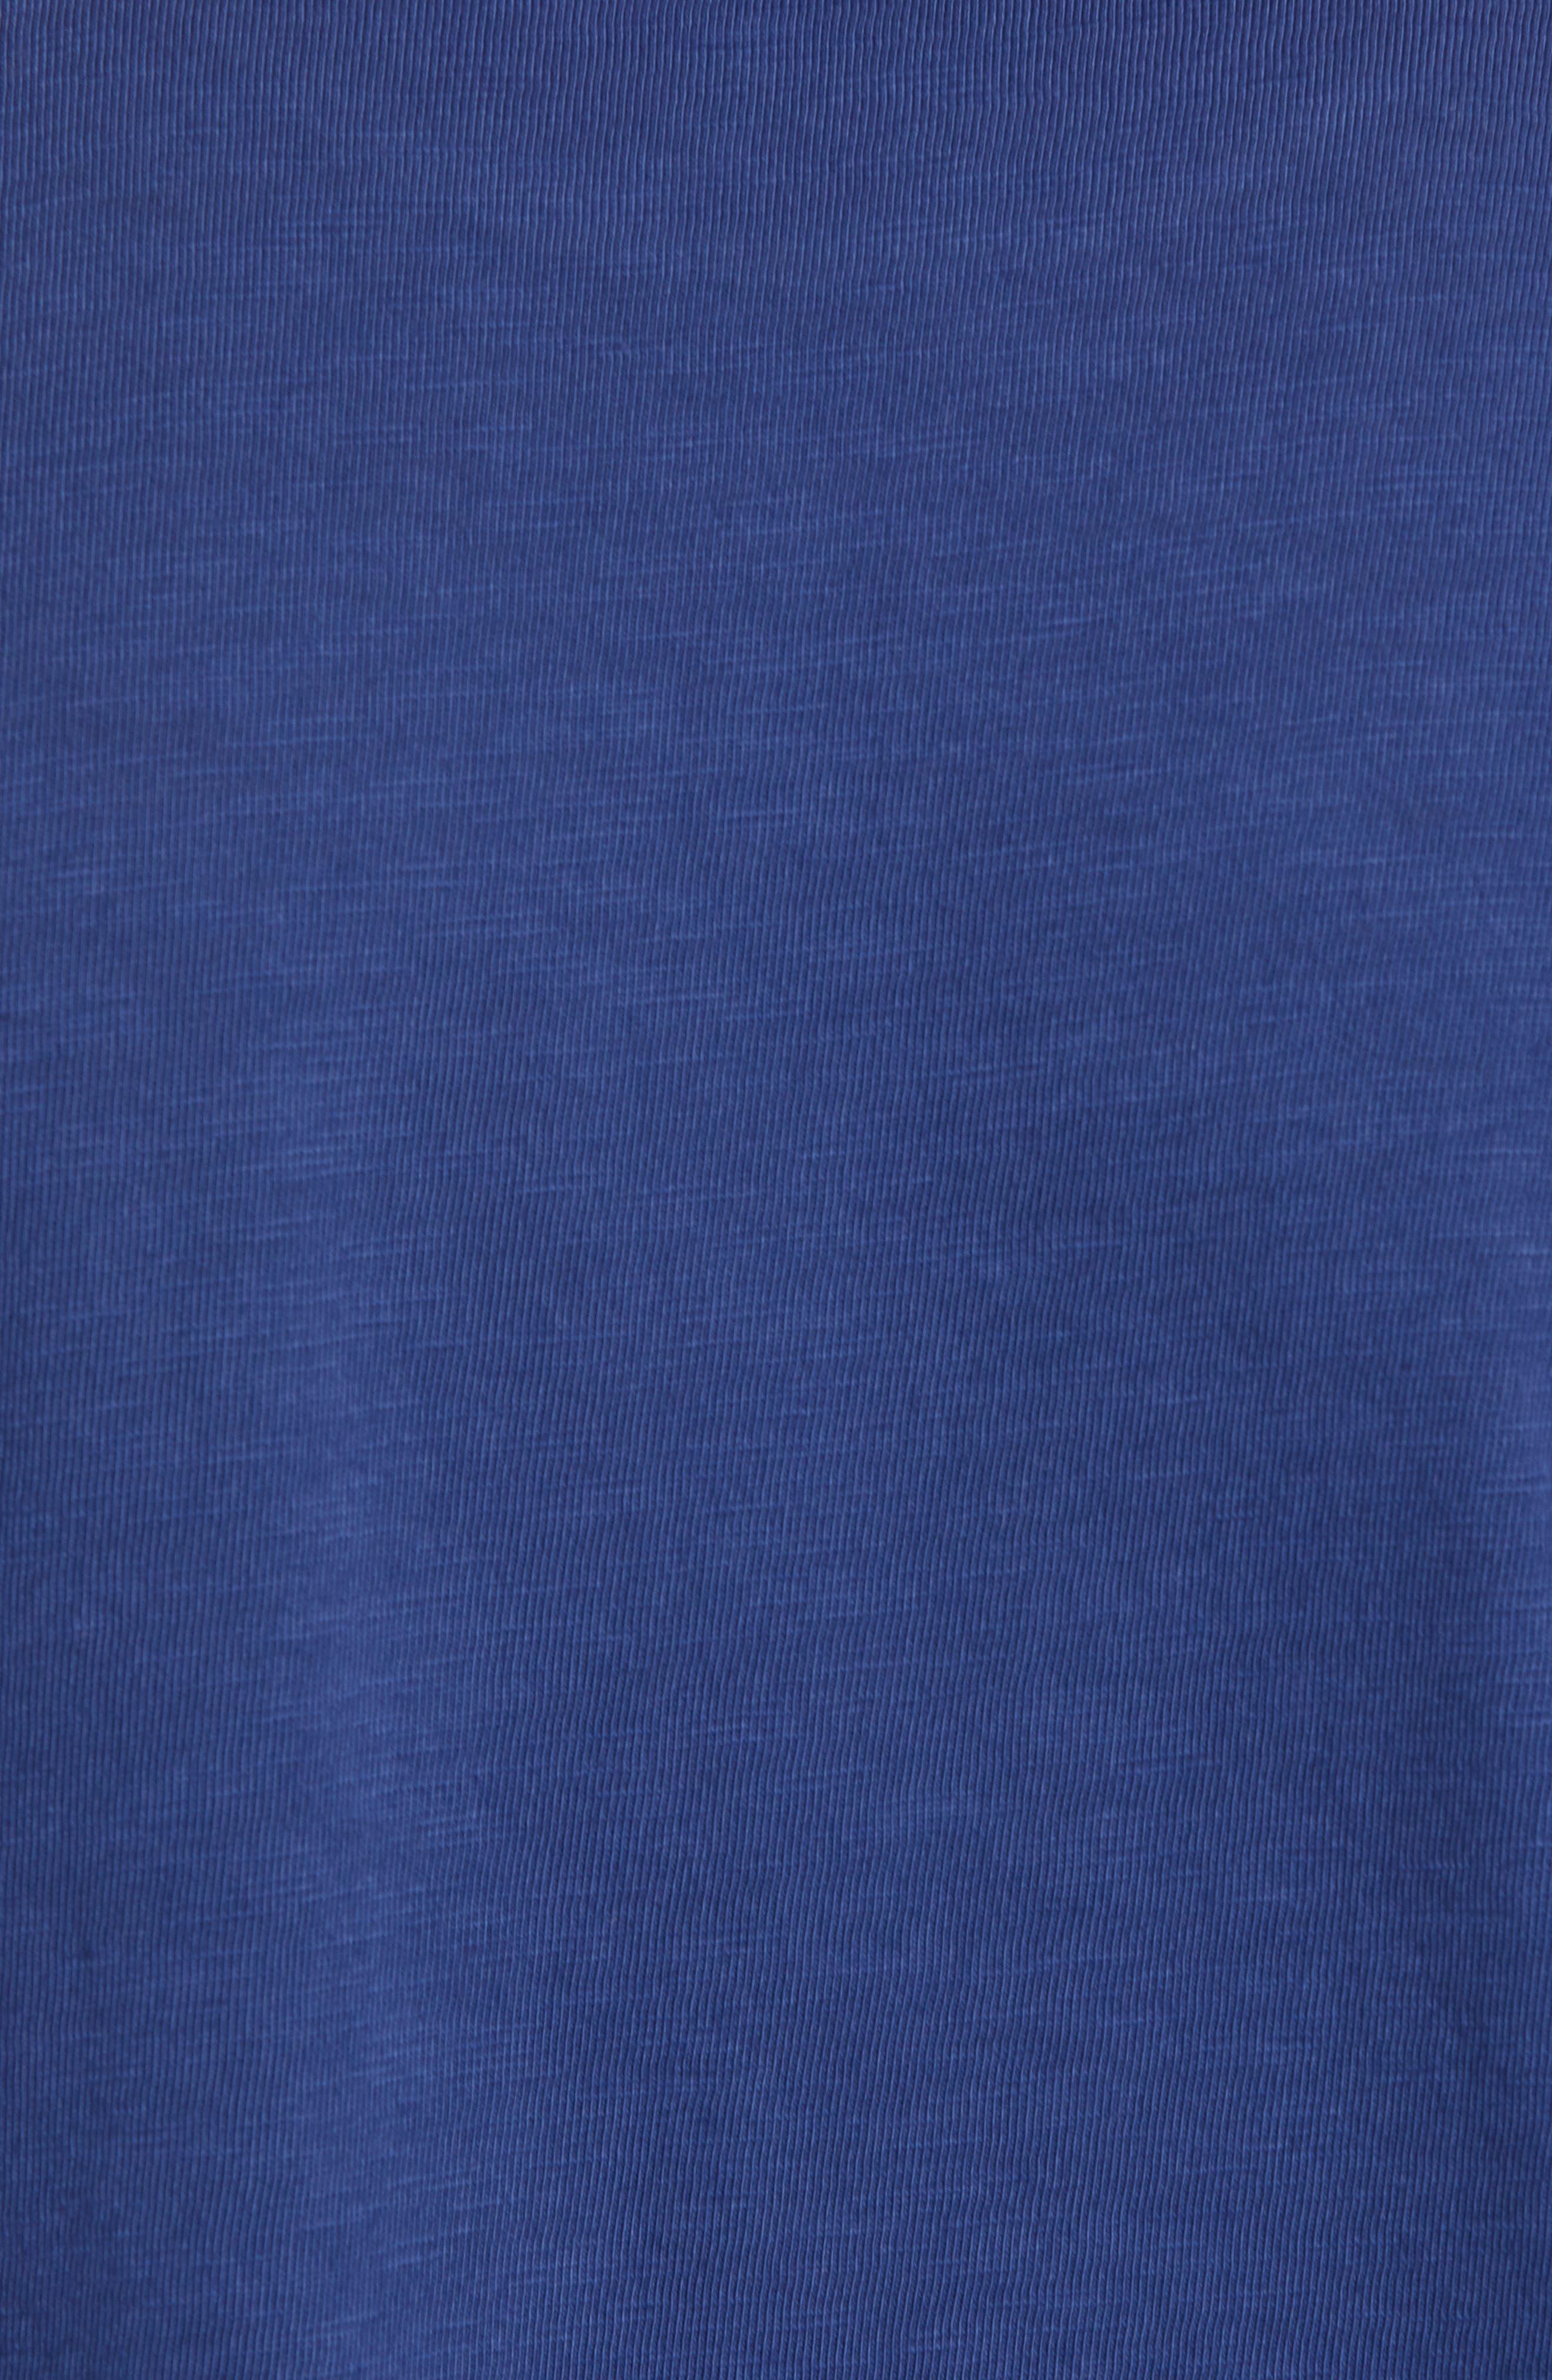 Scallop Hem Slub Crewneck T-Shirt,                             Alternate thumbnail 5, color,                             GOODLIFE NAVY